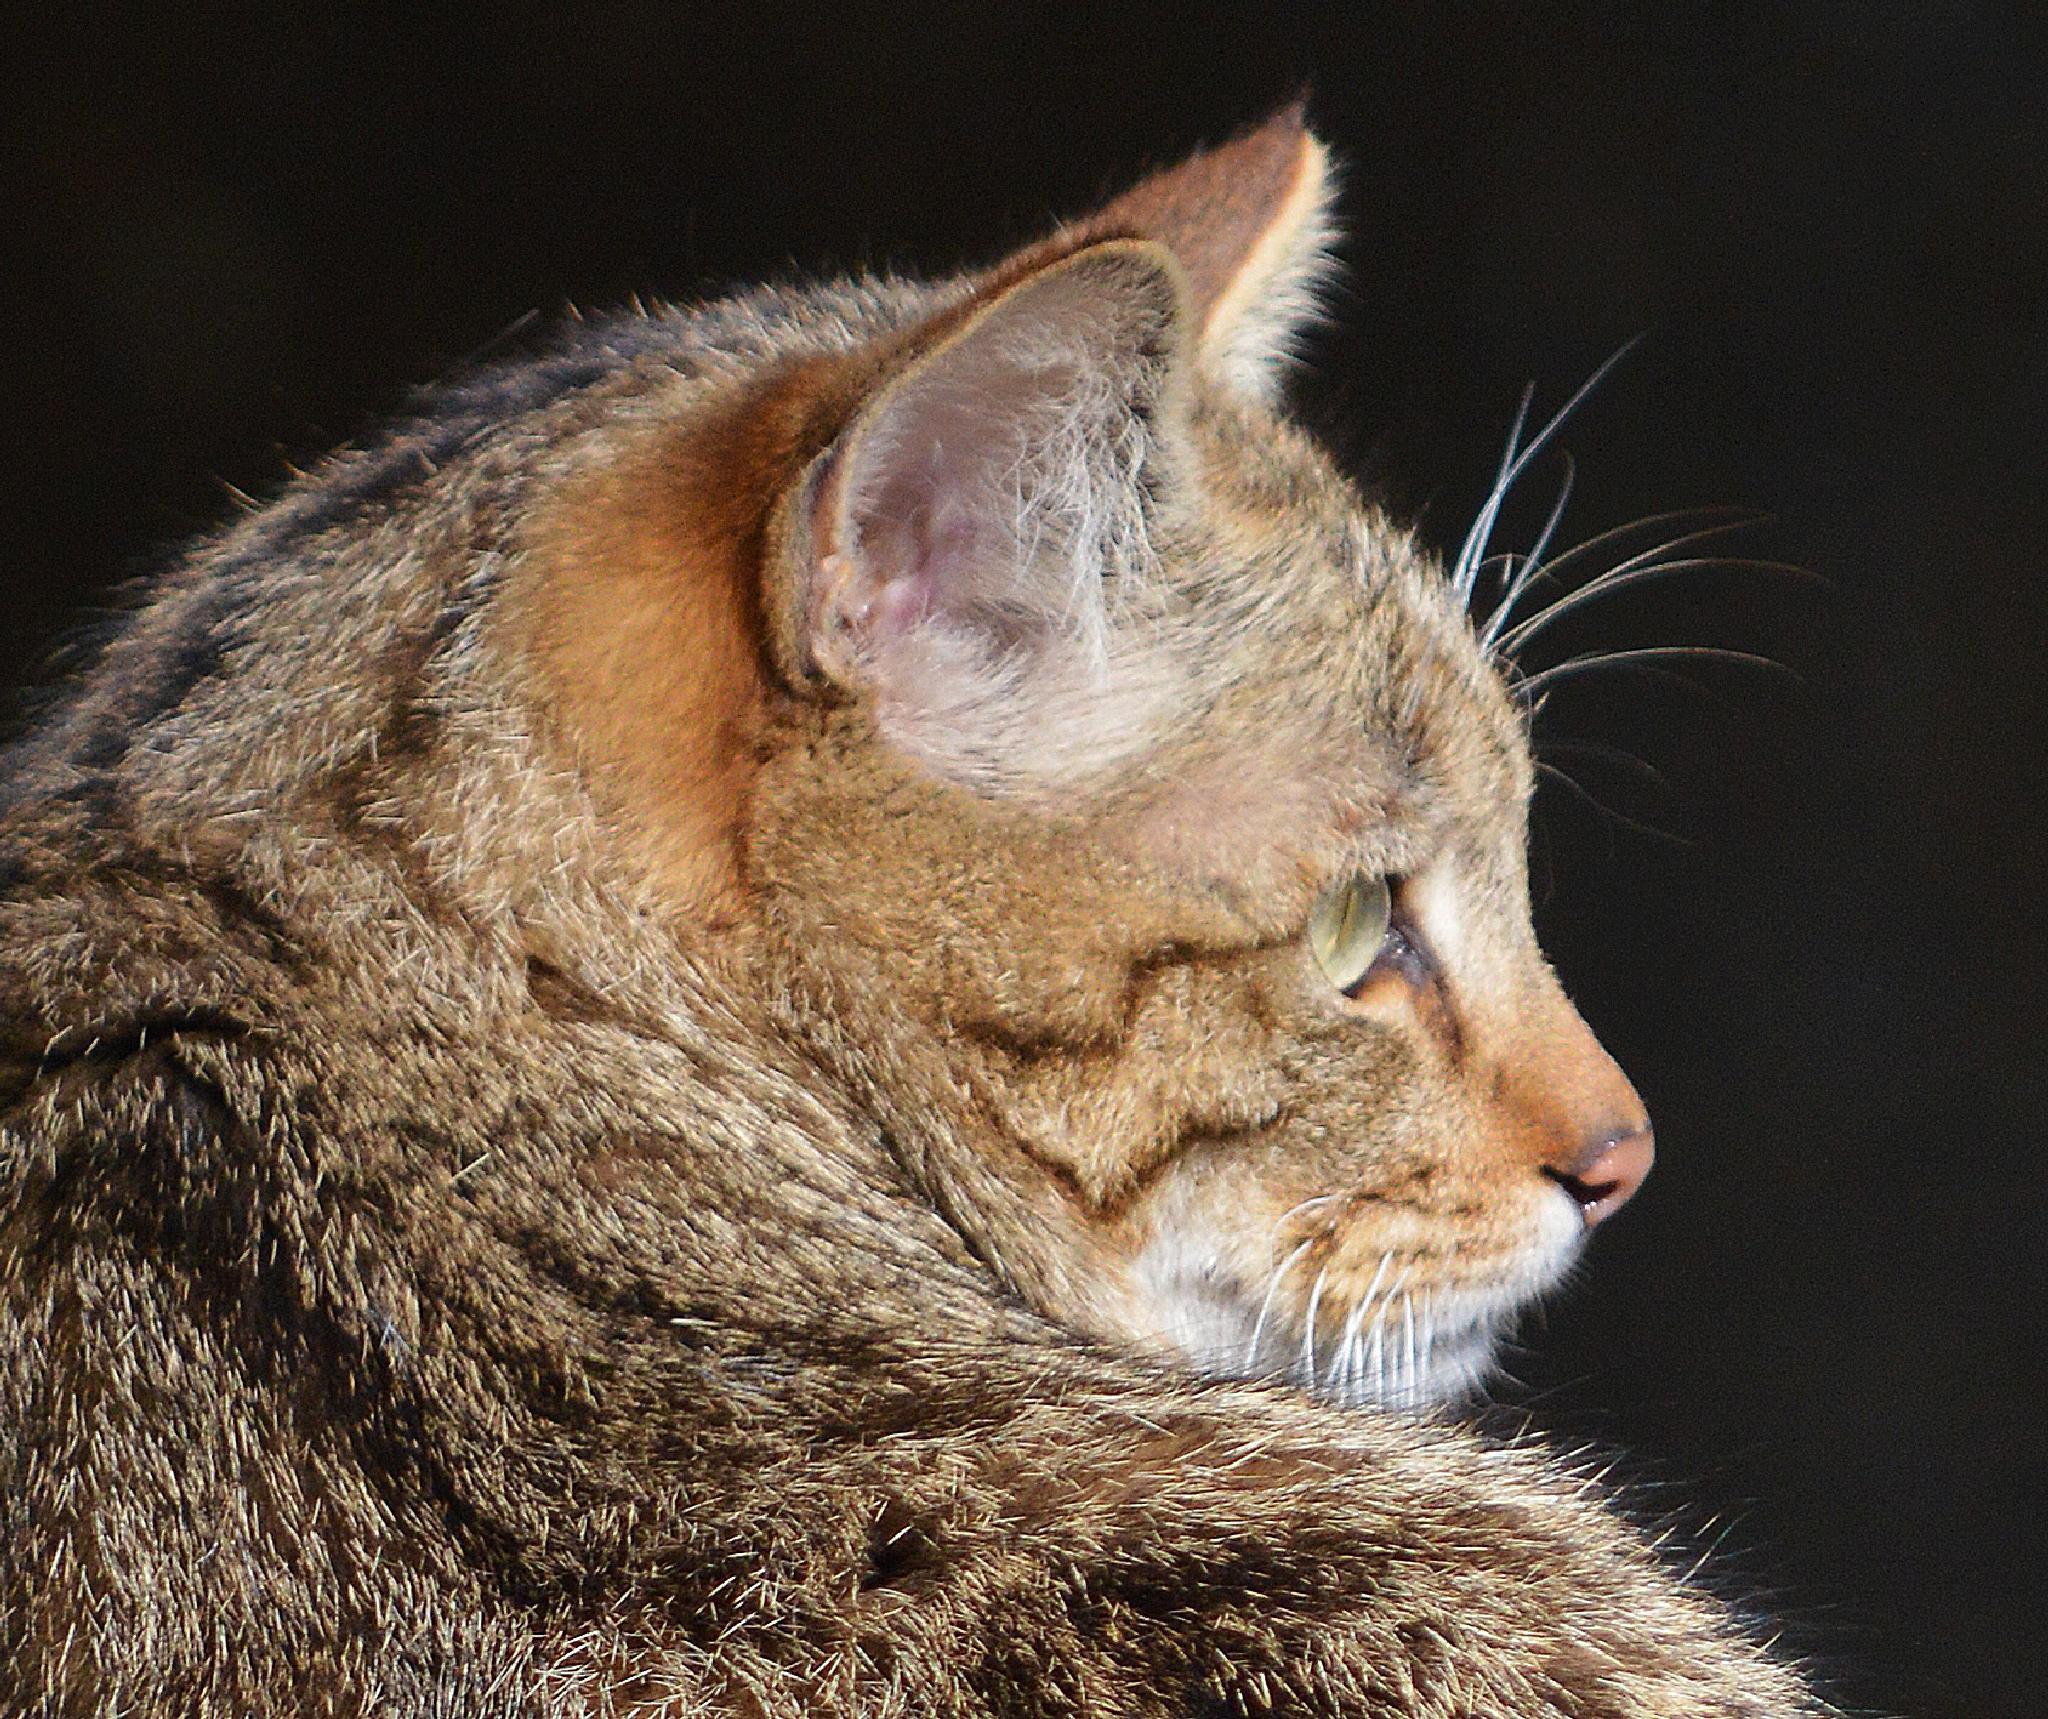 Wildcat 3 by Jean-Claude Monnerat